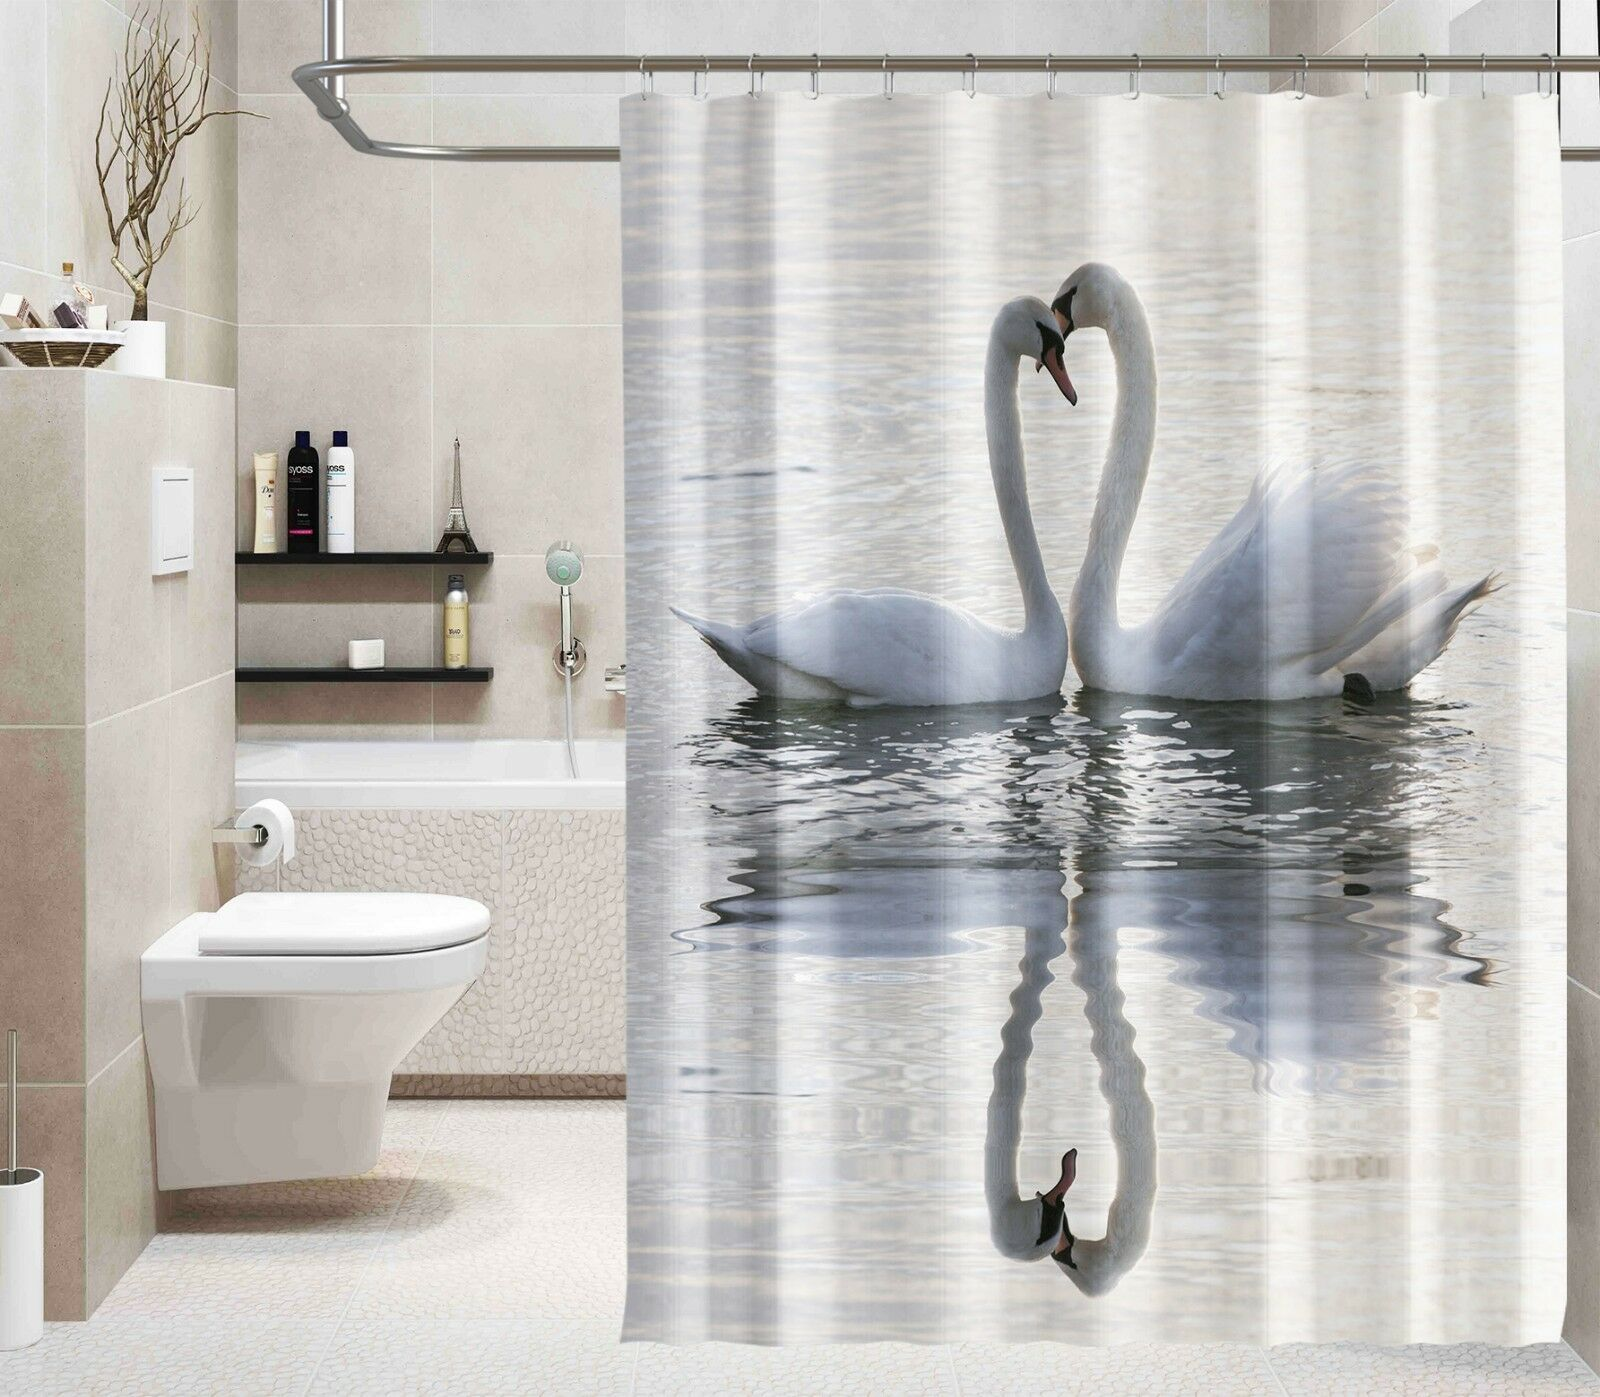 3D Weiß Schwan Schwan Schwan See 8 Duschvorhang Wasserdicht Faser Bad Daheim Windows Toilette | New Product 2019  f636e2